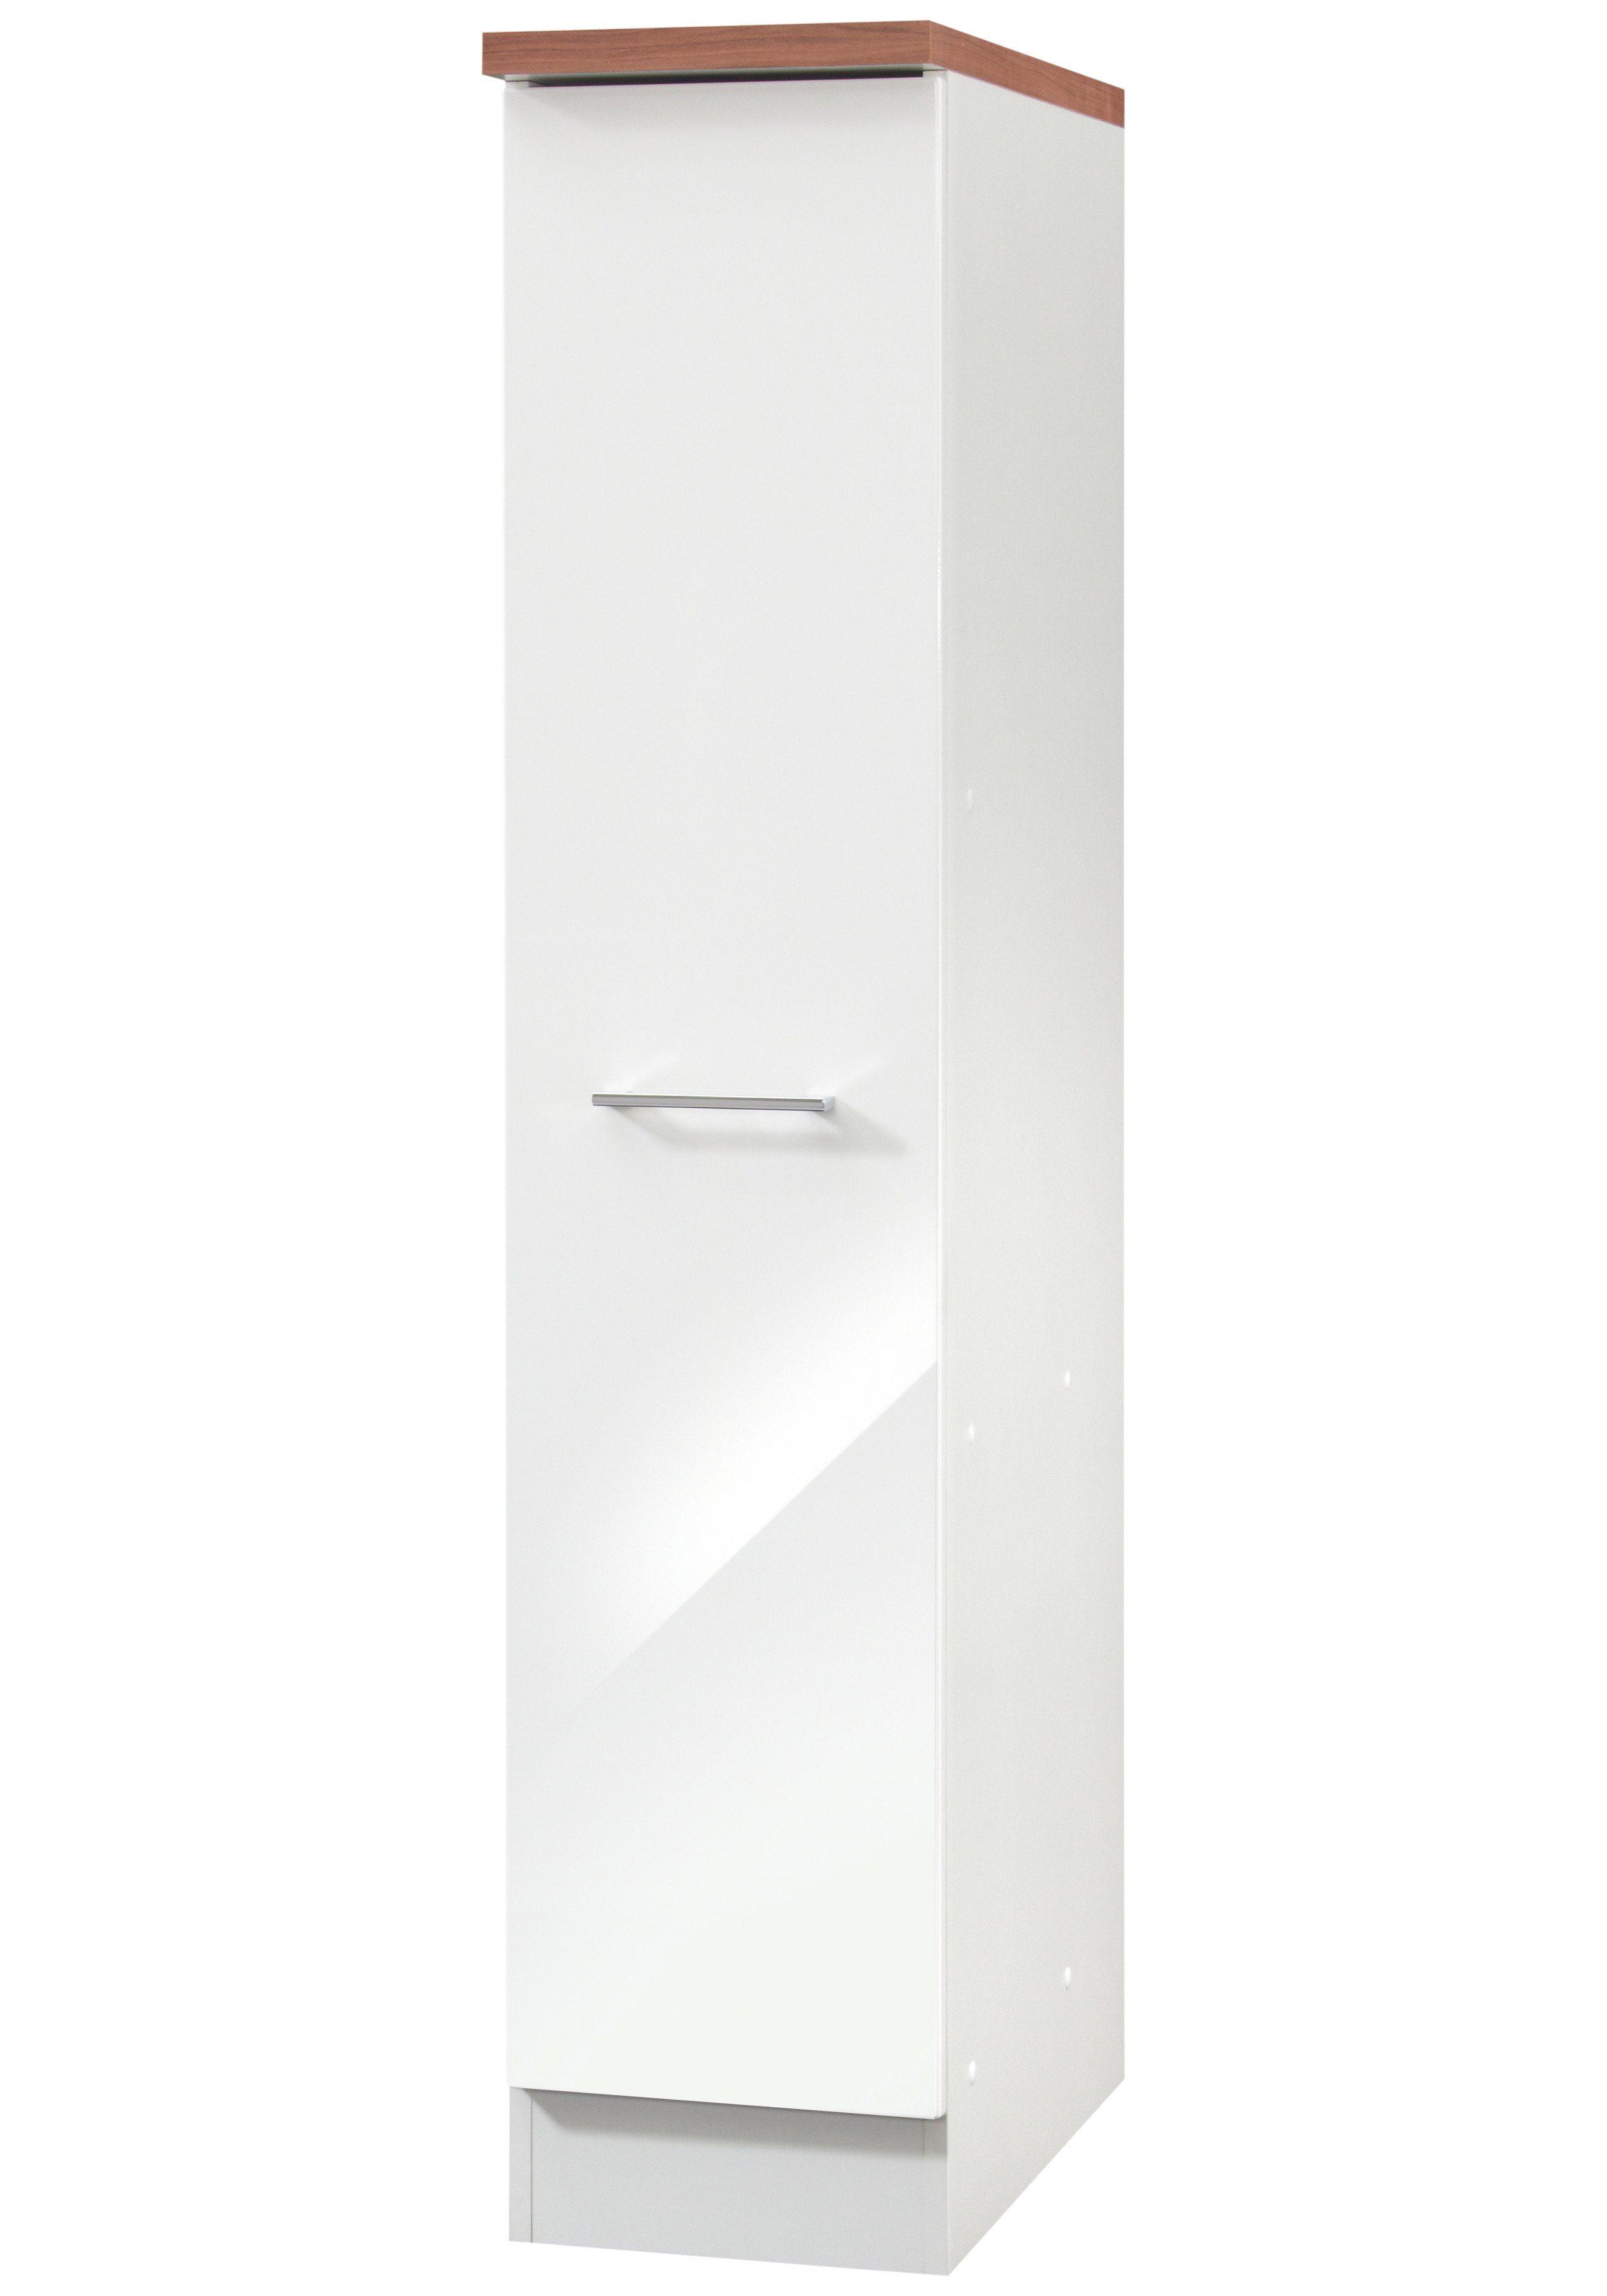 Wundervoll Held Möbel Apothekerschrank »Monaco«, Höhe 165 cm | OTTO EI28